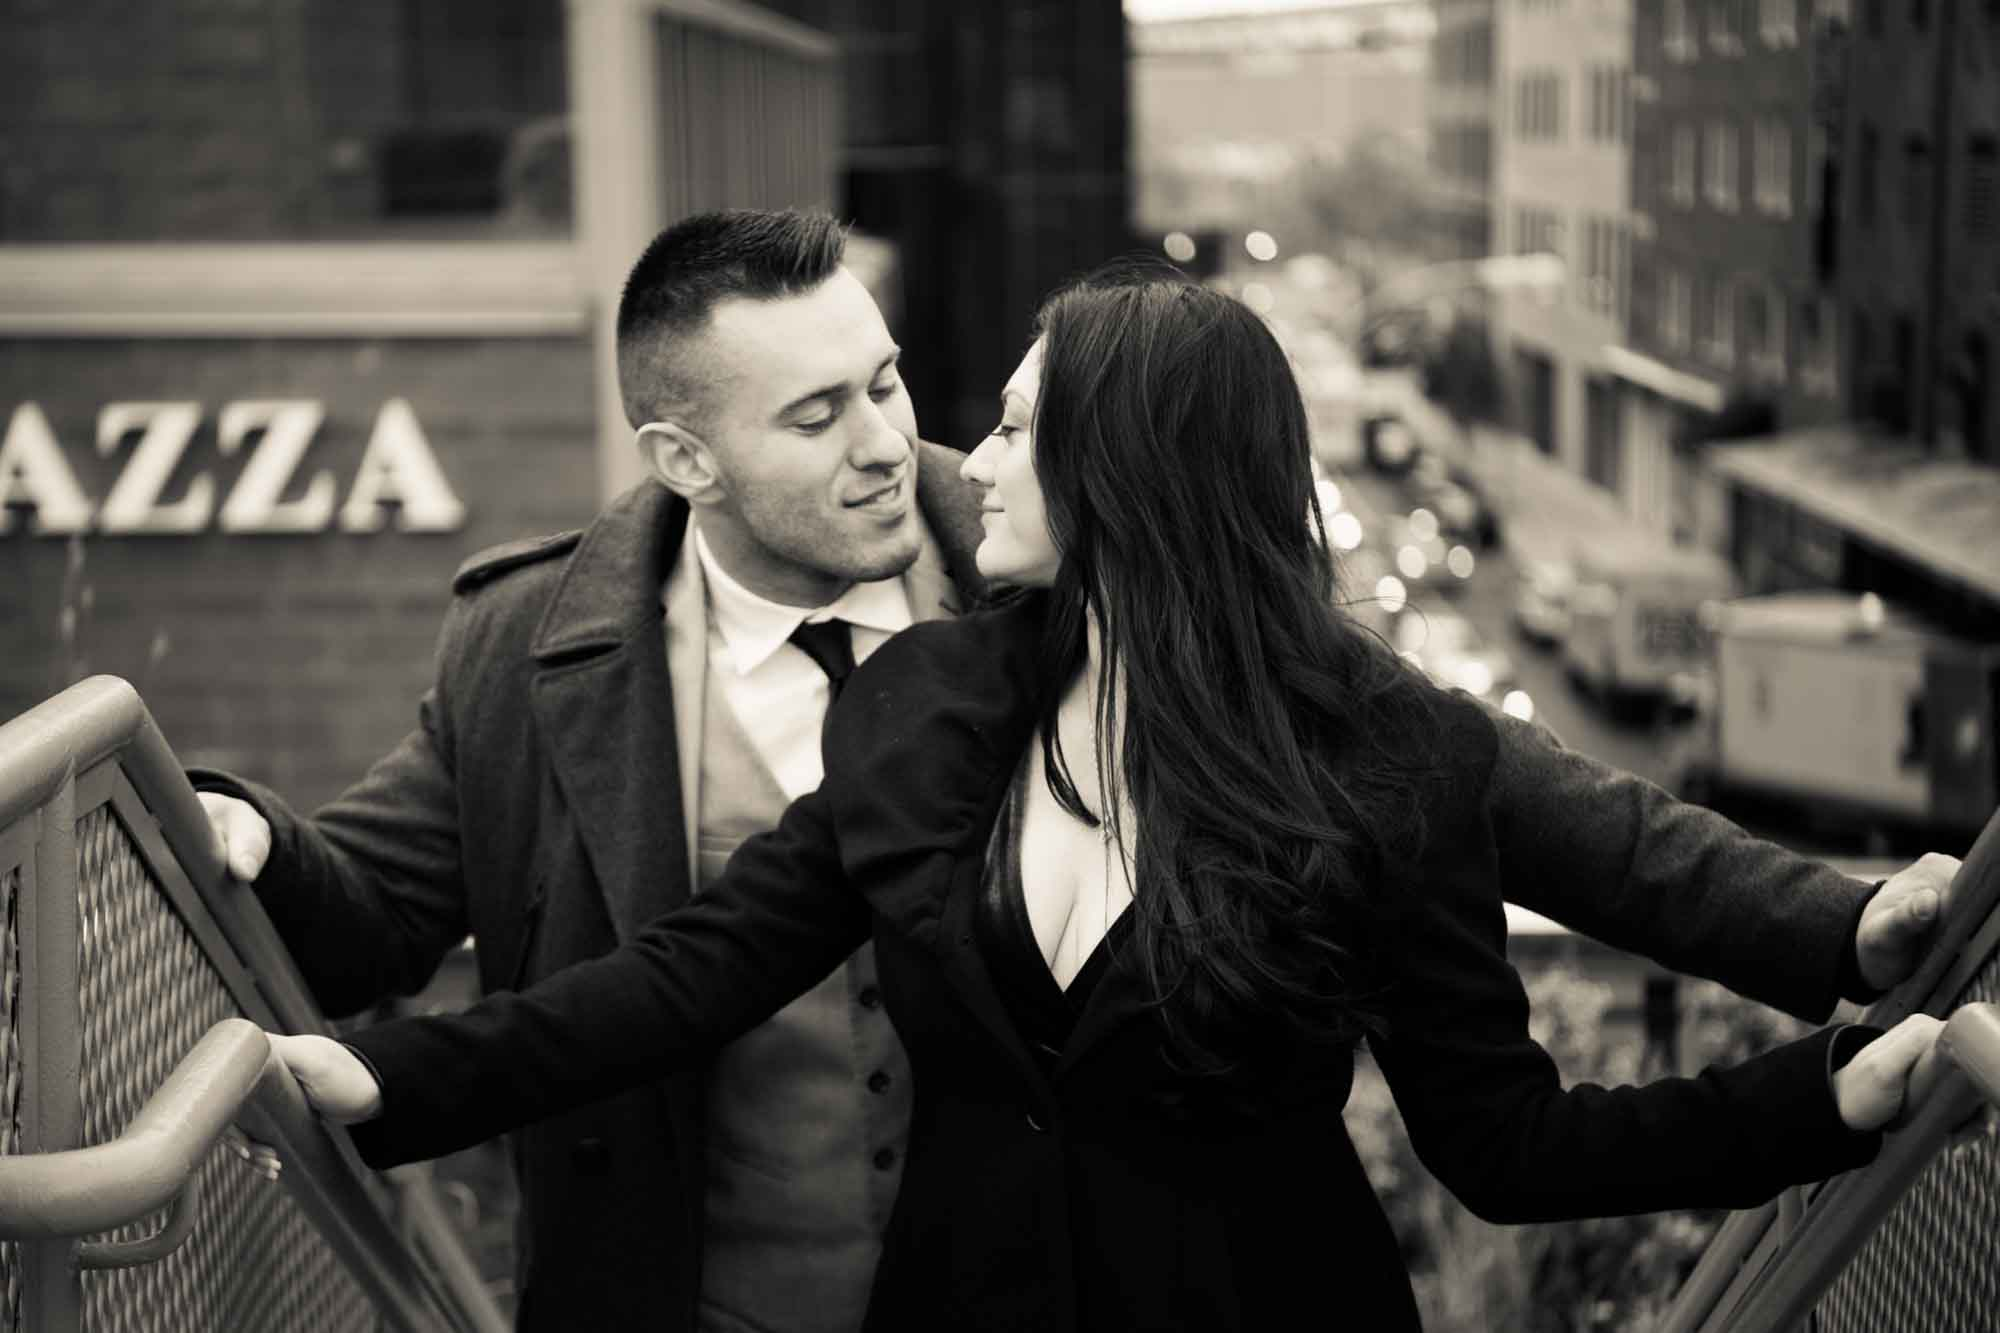 Weddings-Engagements-Jamie-Levine-Photography-NYC-11.jpg